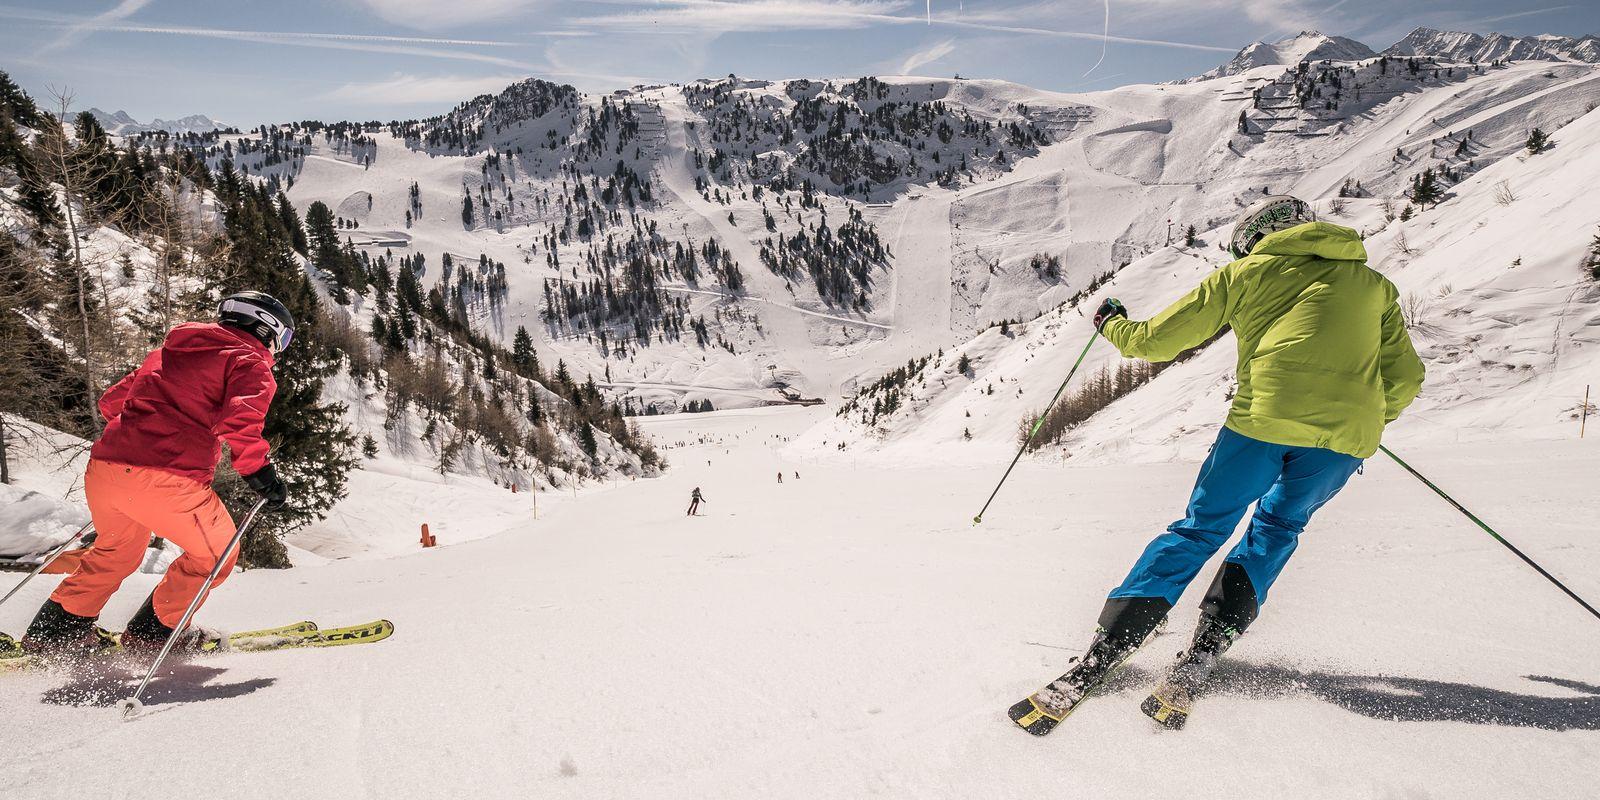 Skiing in Mayrhofen | Archive TVB Mayrhofen©Dominic Ebenbichler